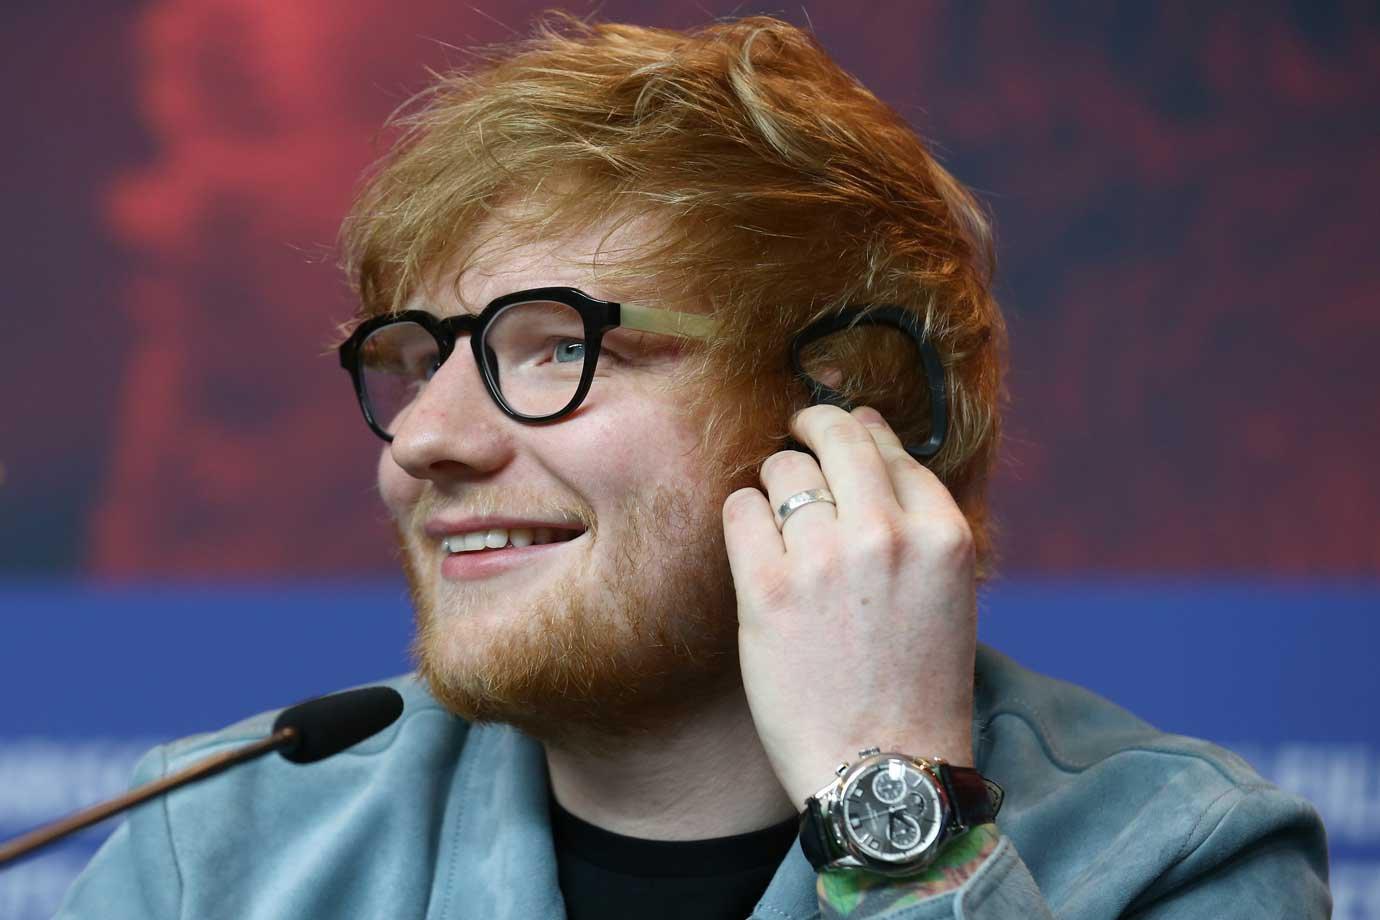 Músico Ed Sheeran, dia 23/02/2018